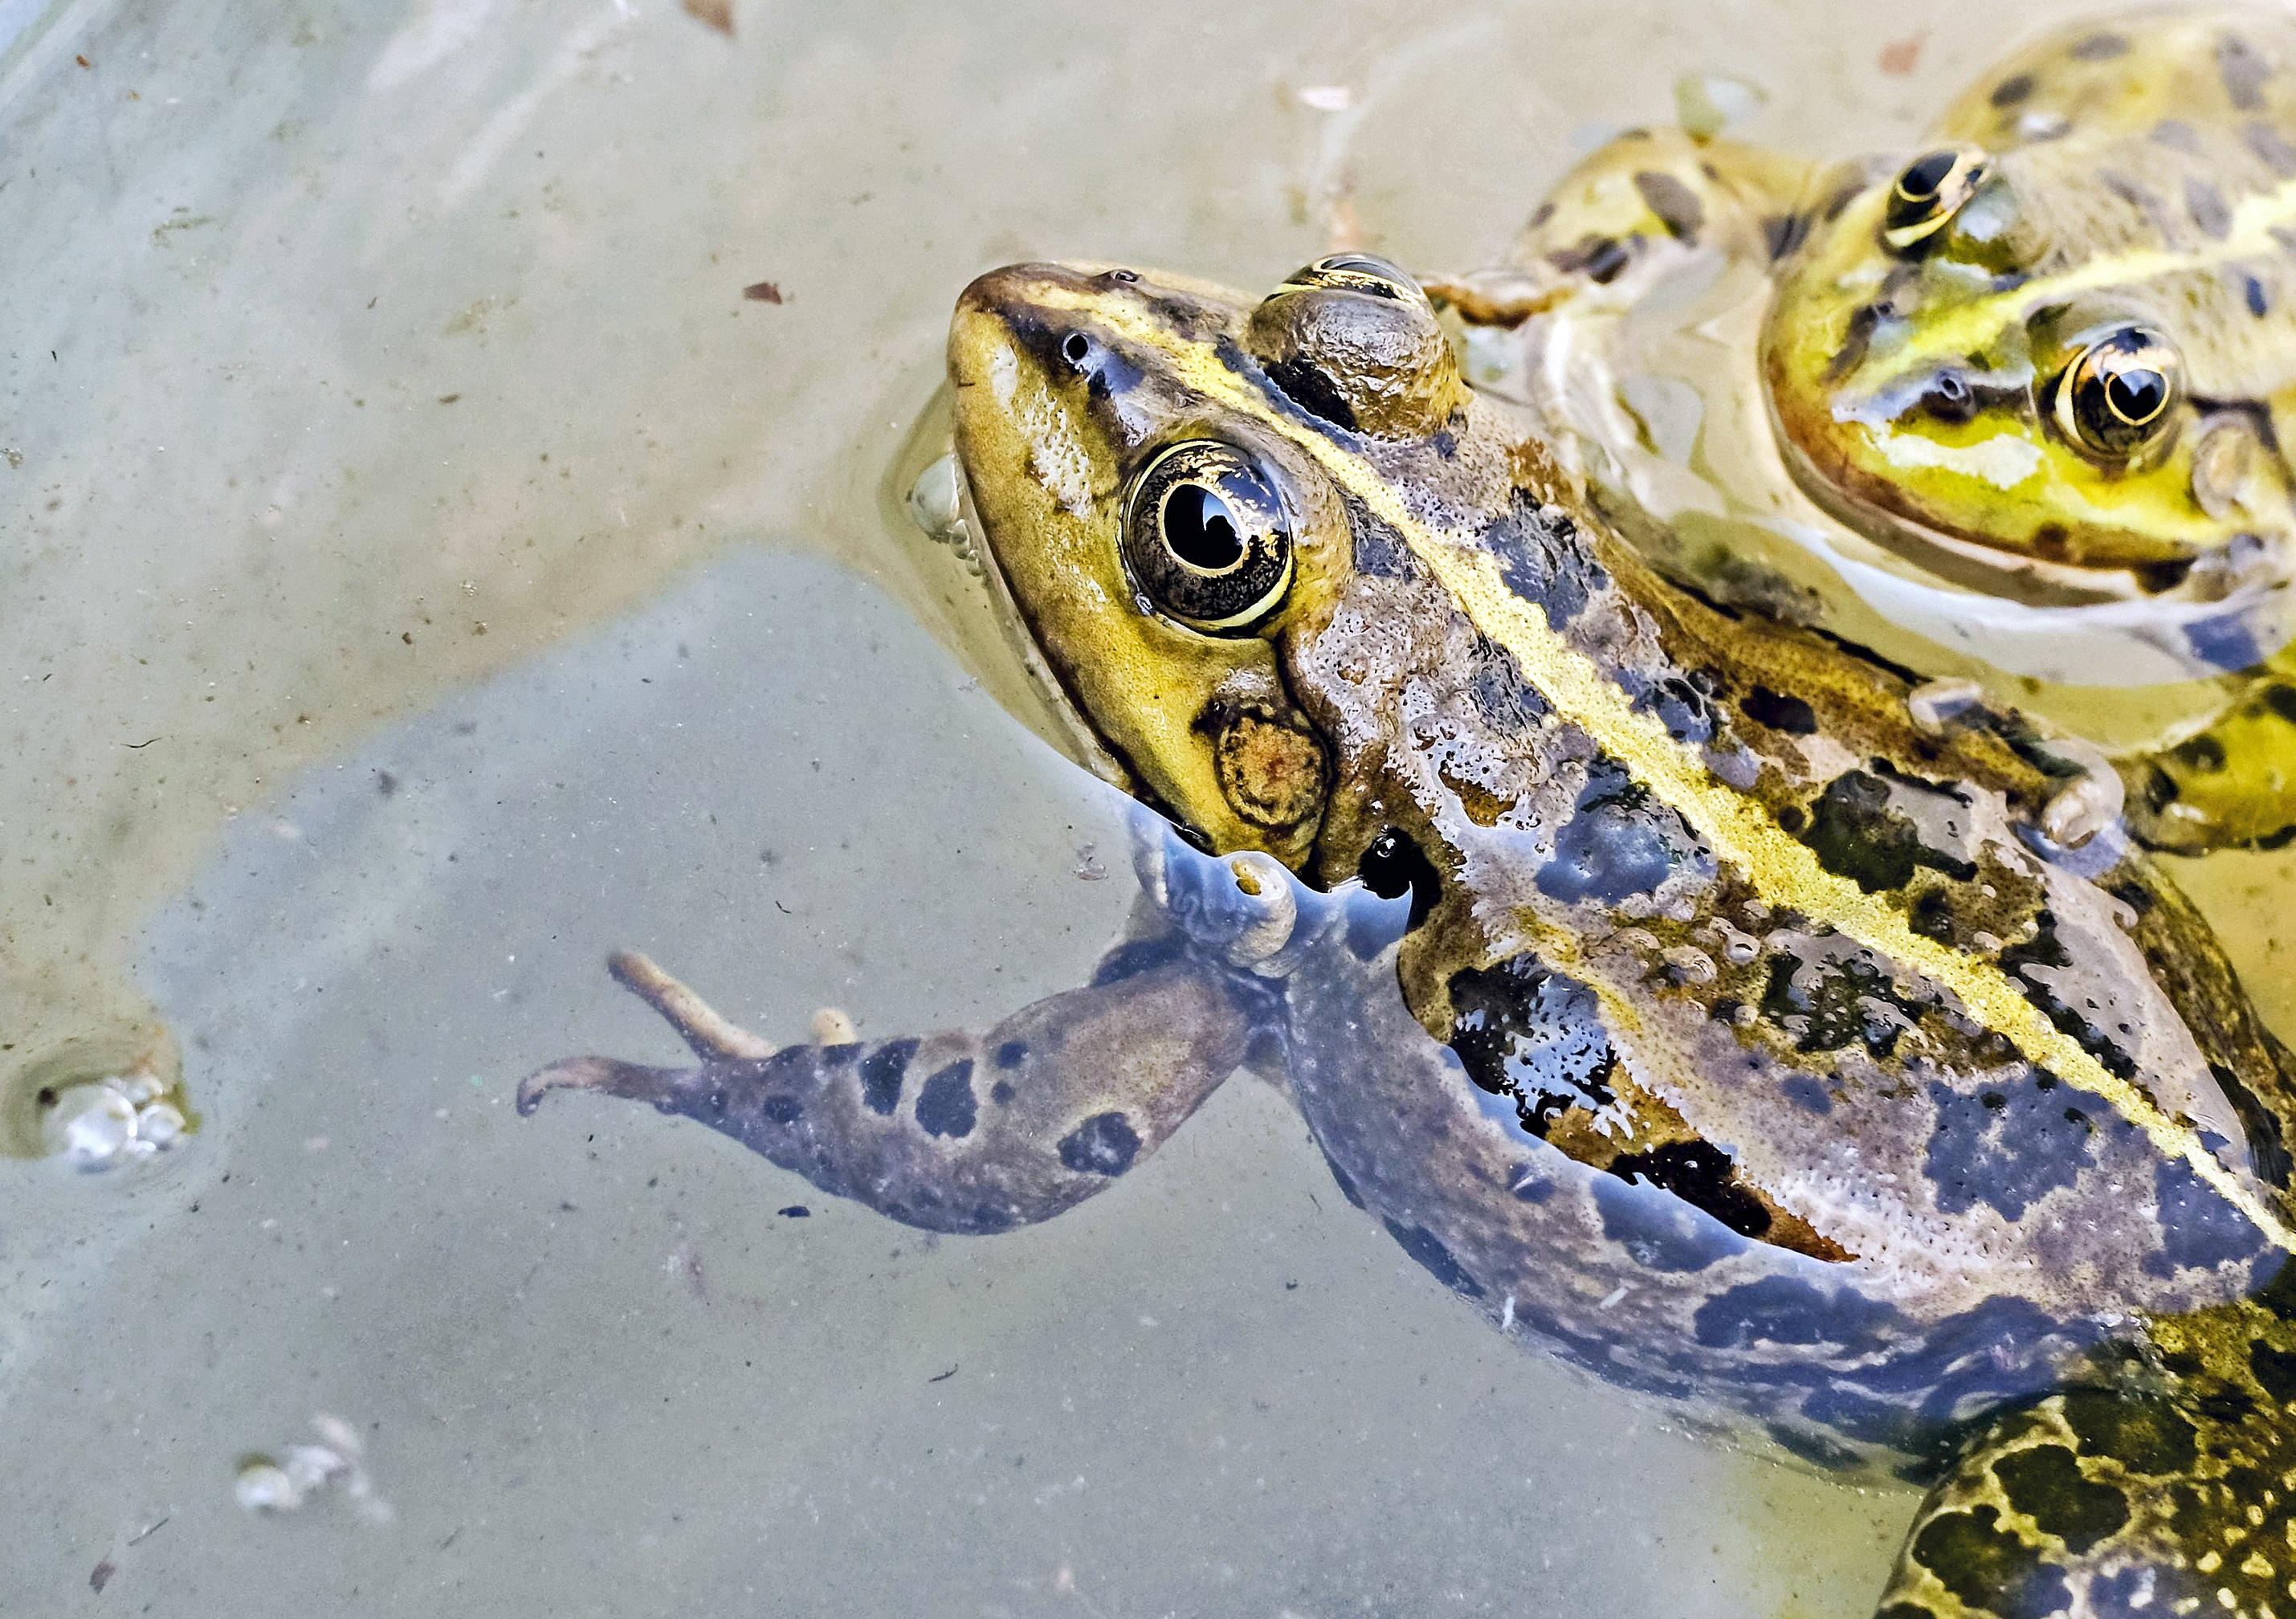 free images animal wildlife green amphibian fauna close up